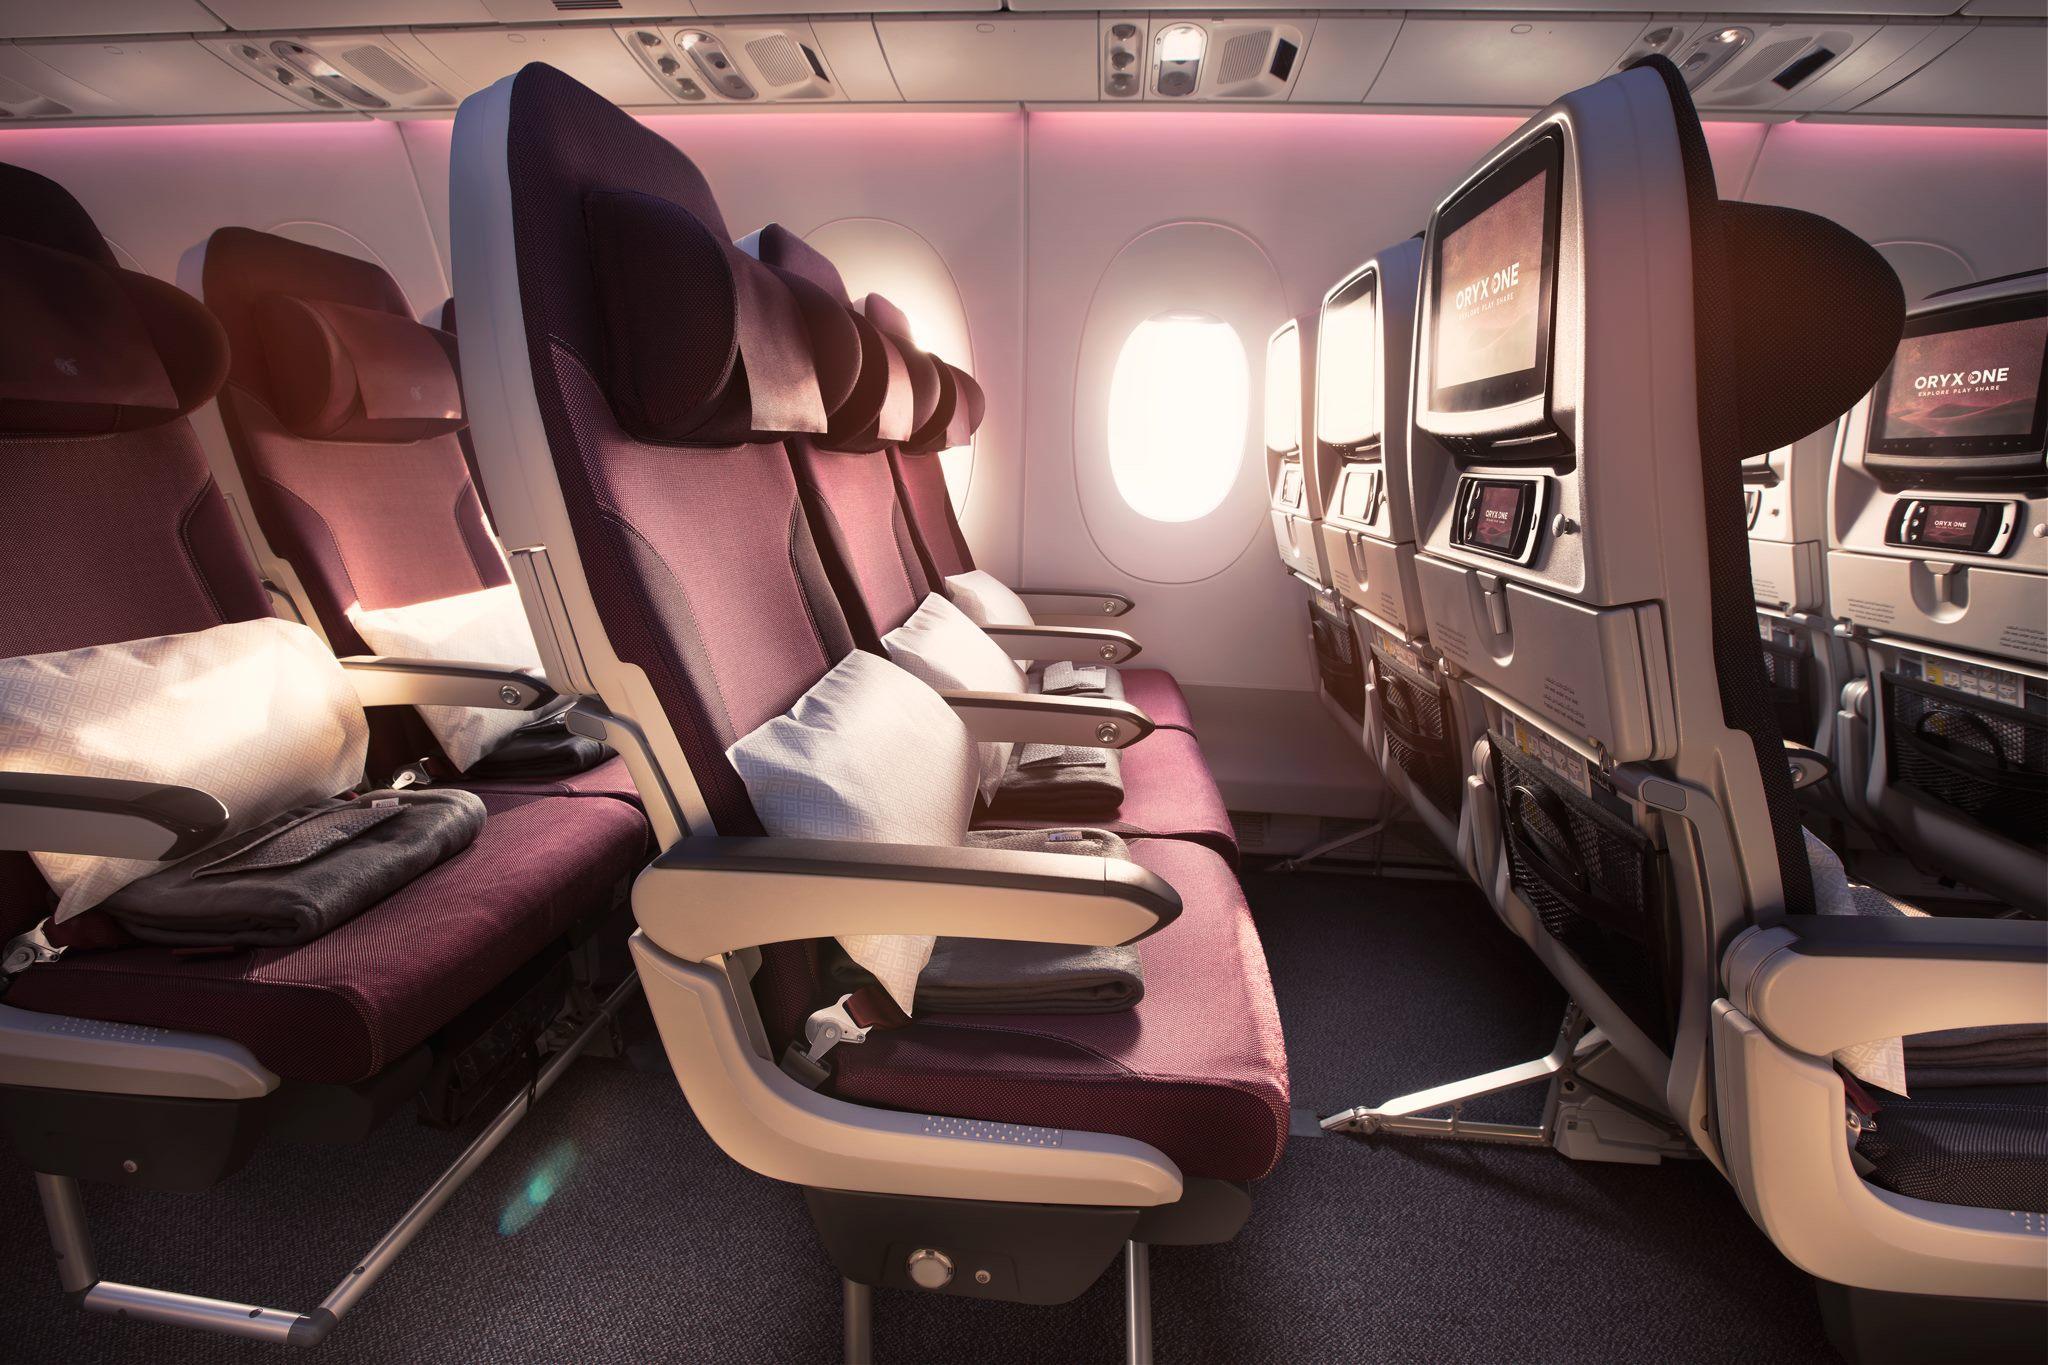 Qatar Airways Review: A380 Economy Class